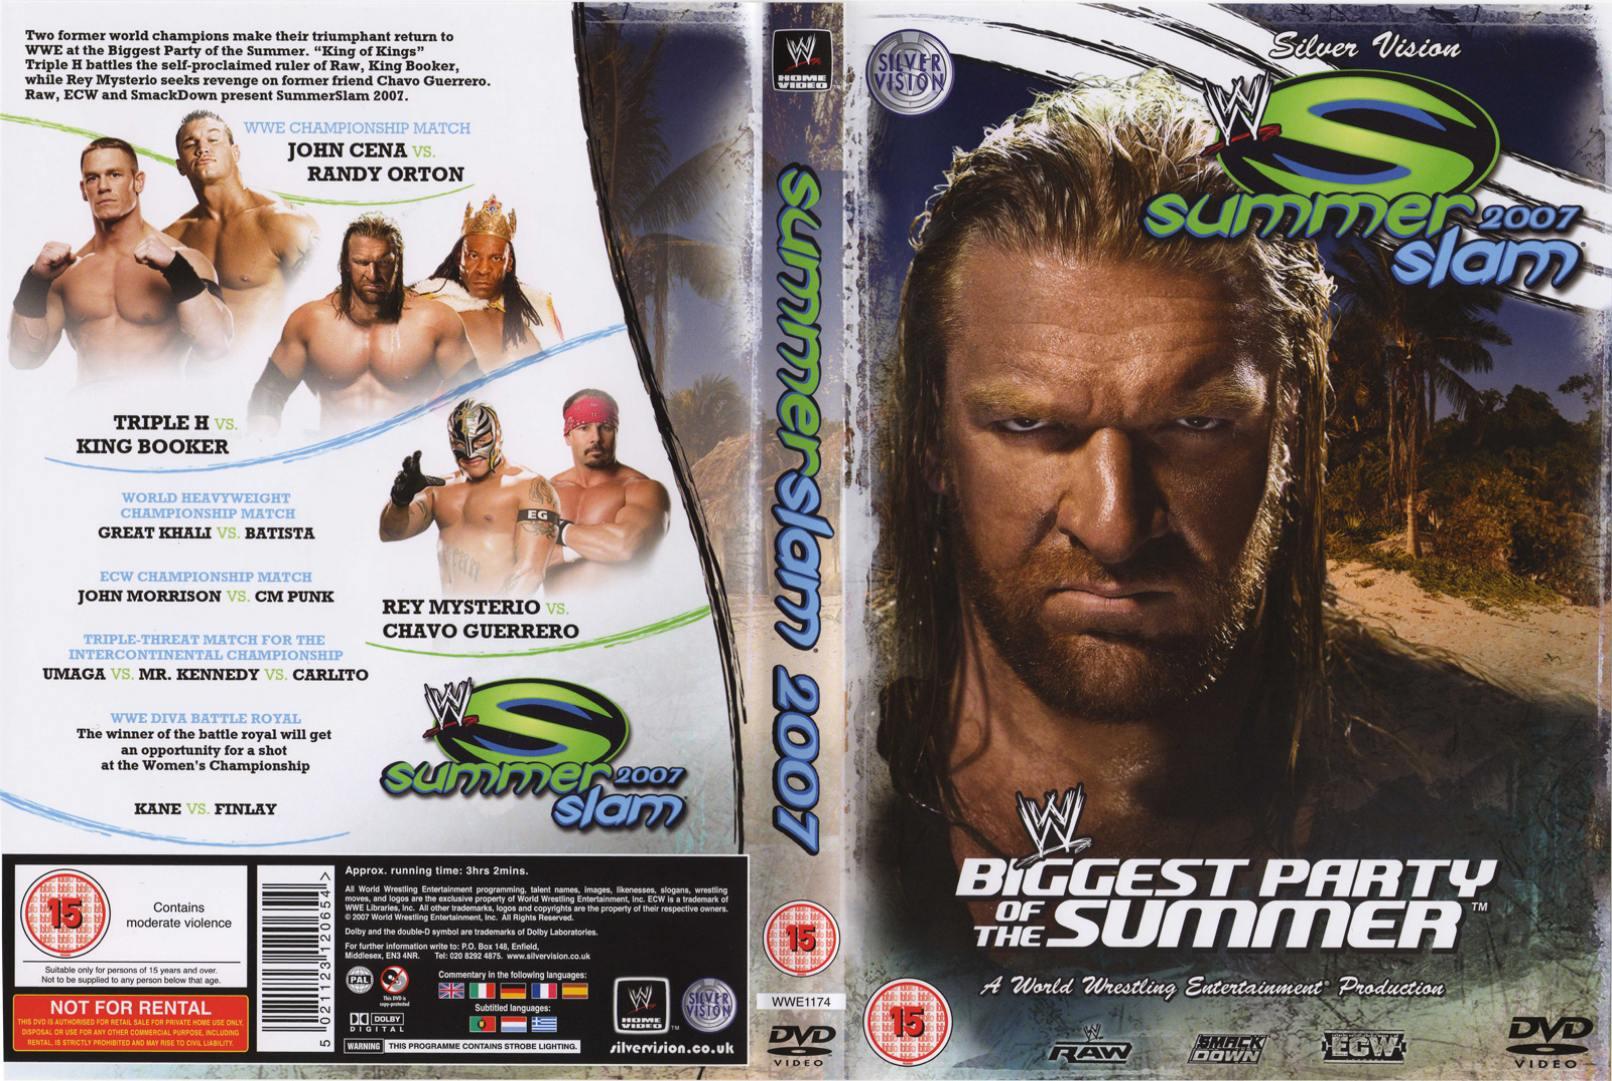 SummerSlam 2007 DVD